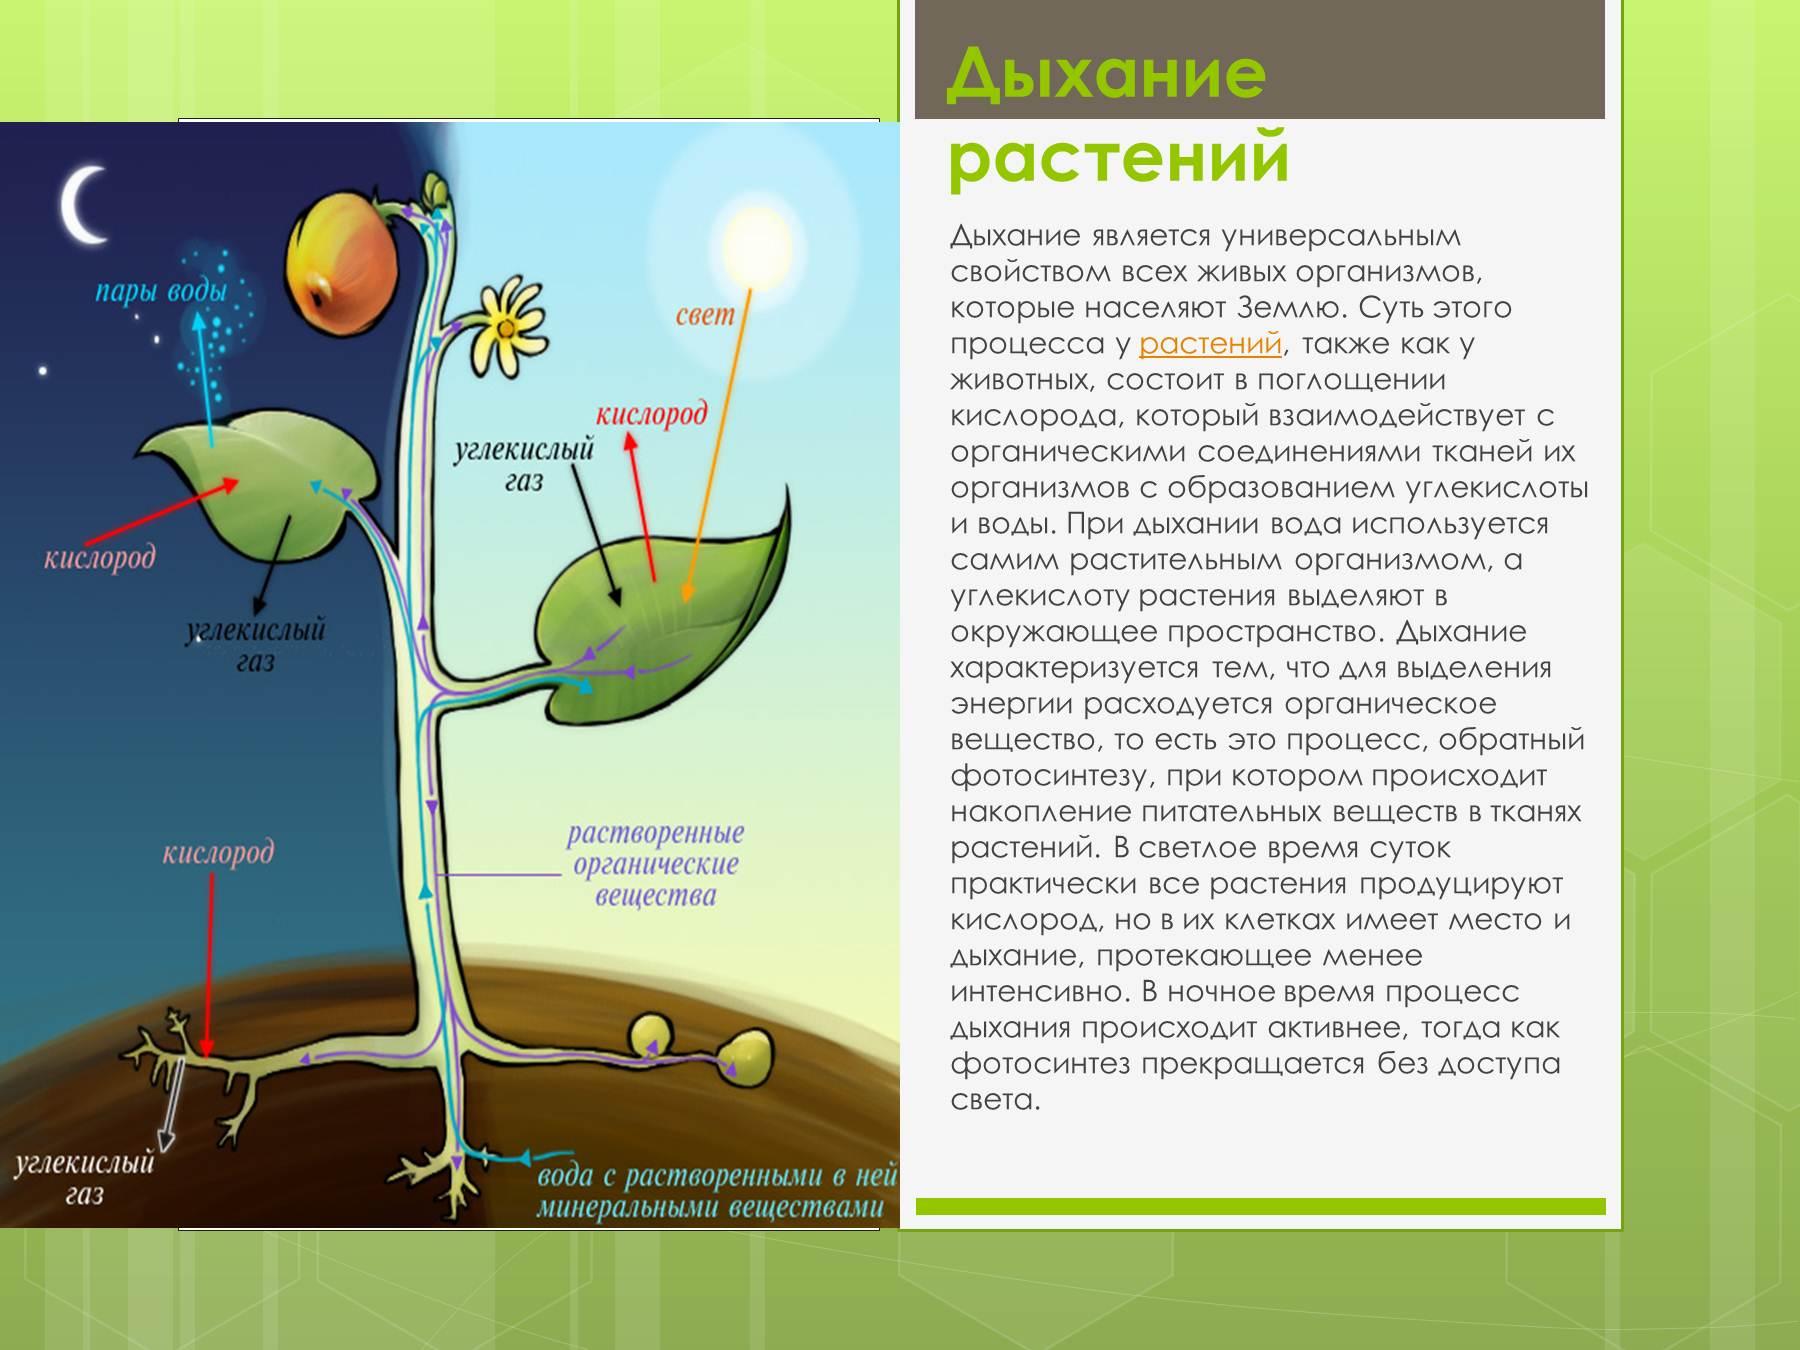 бузова фотосинтез как свойство растений вирусное заболевание